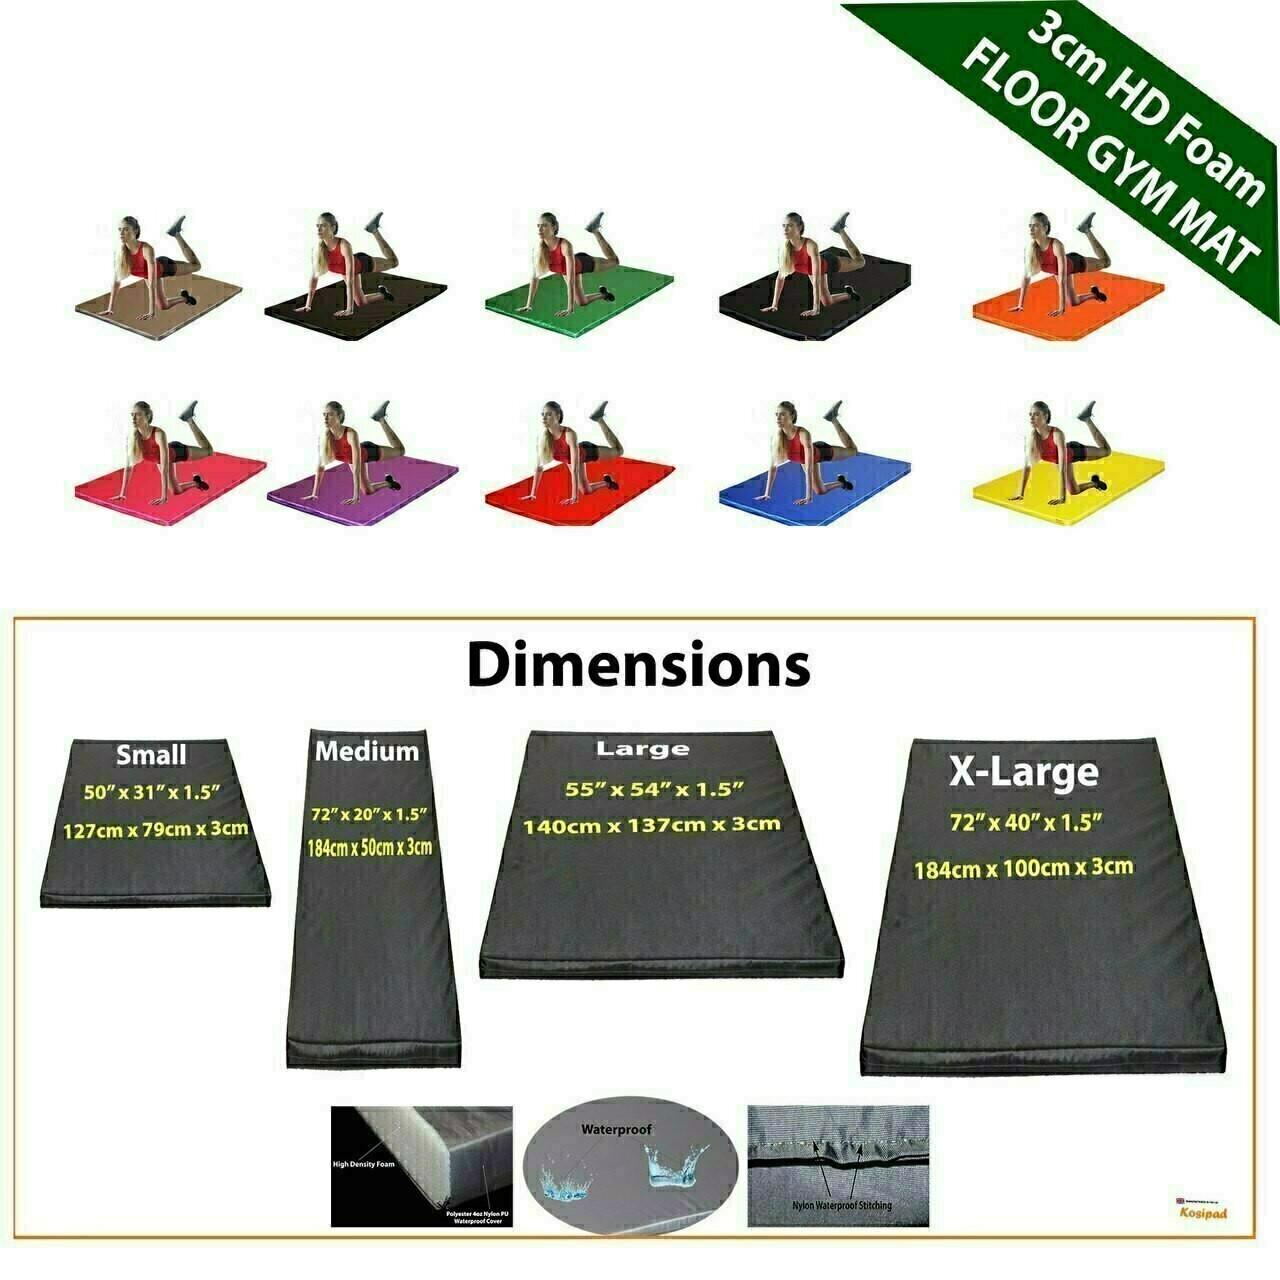 Kosipad 3cm Thick foam floor gym crash mats Navy Blue Dimensions